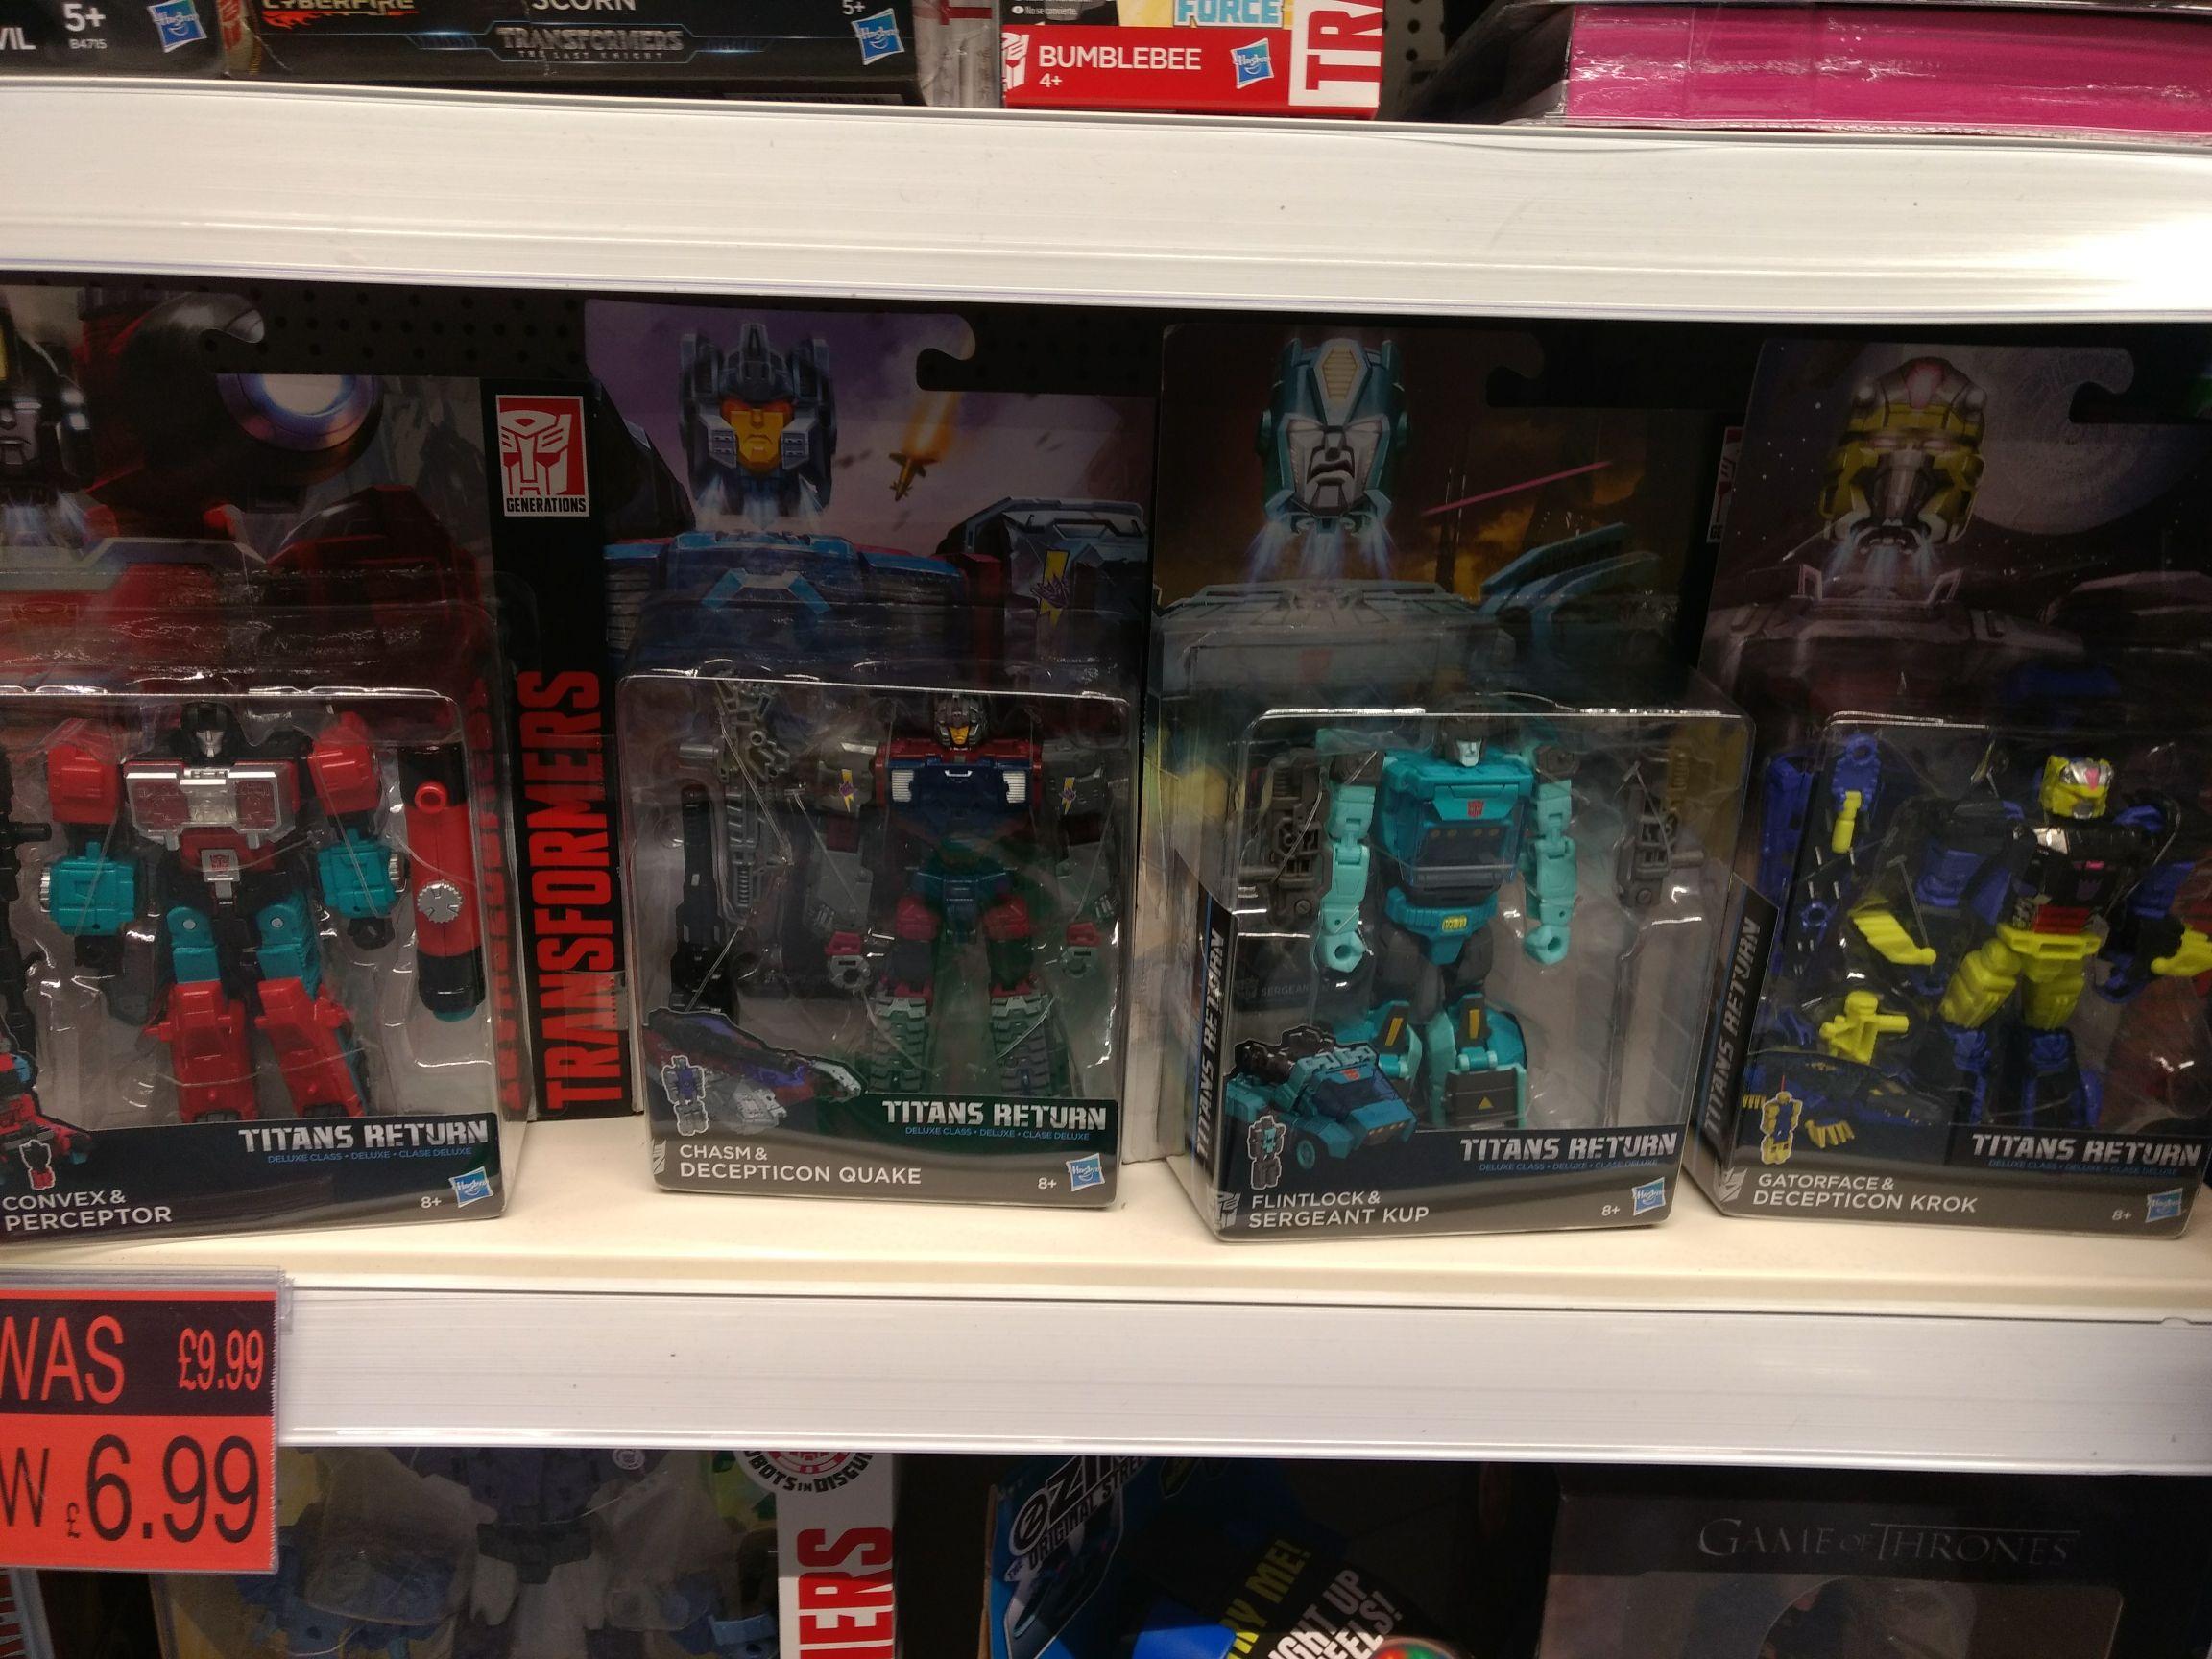 Transformers Titans Return B&M Bargains - £5.99